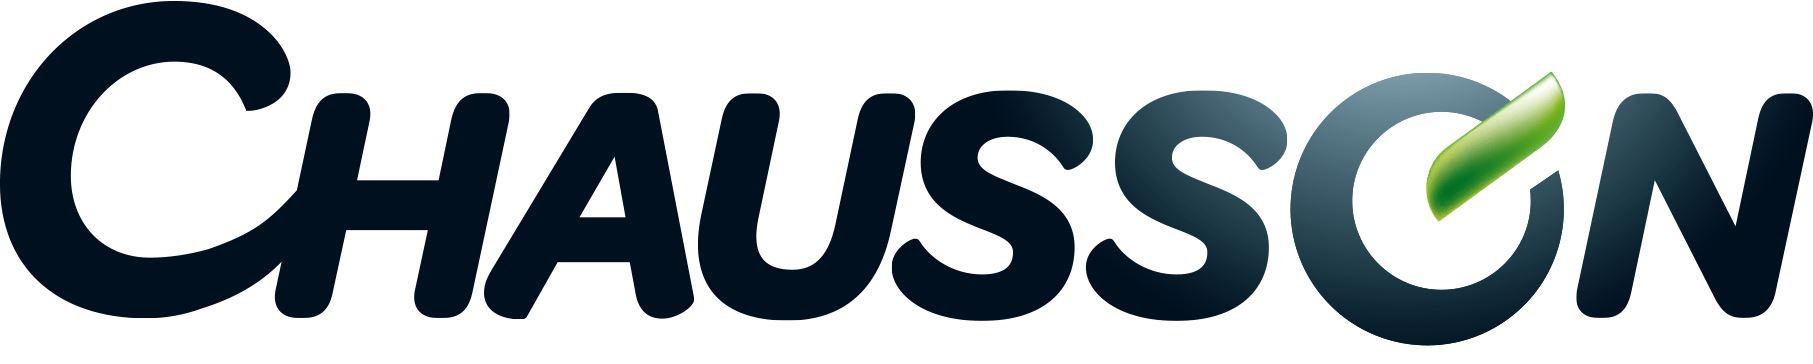 Logo chausson